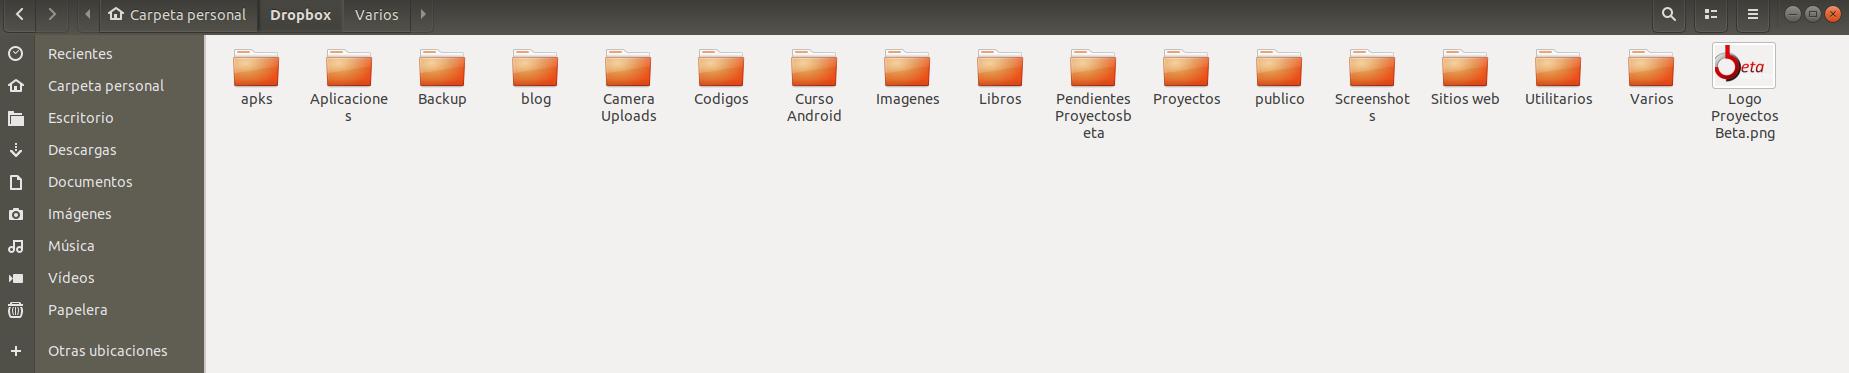 Carpetas sincronizadas de Dropbox en Ubuntu 18.04 LTS Bionic Beaver